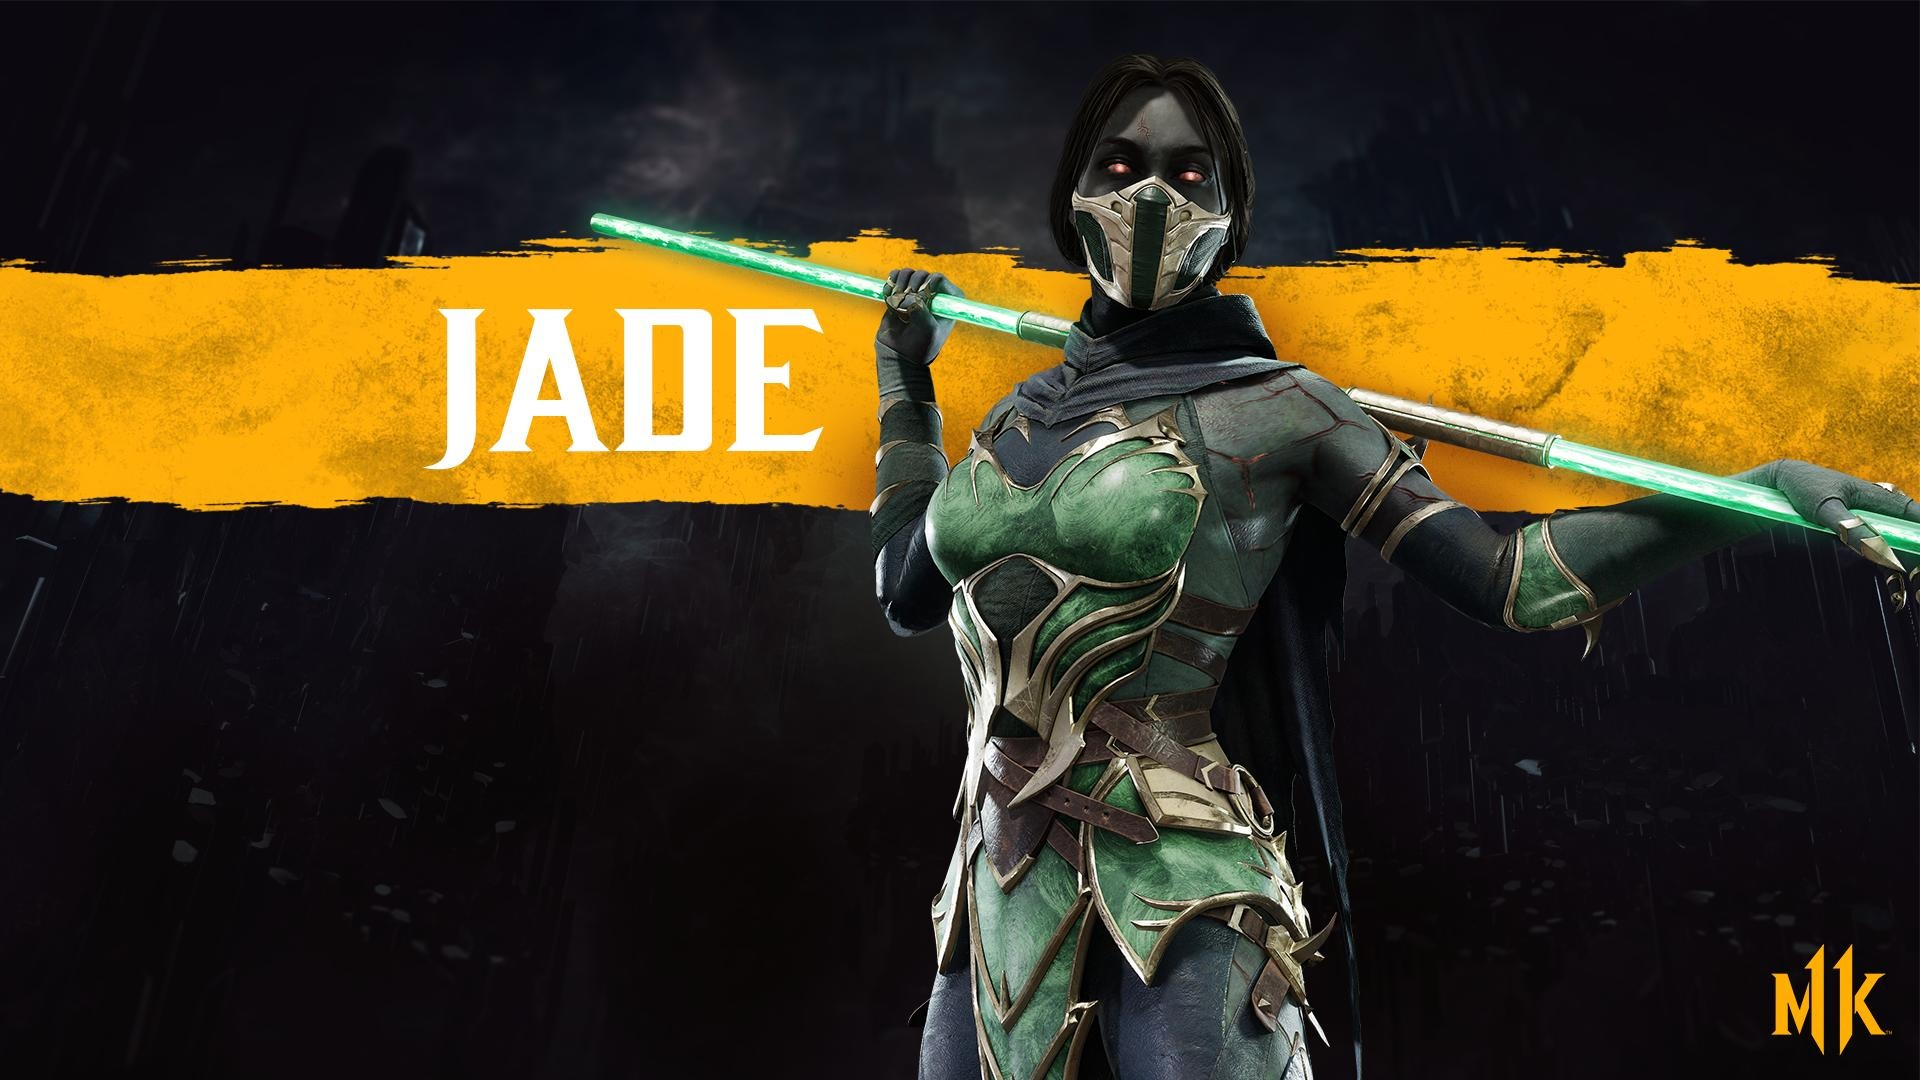 Mortal kombat 11 brings jade back into the fold - Mortal kombat 11 wallpaper ...